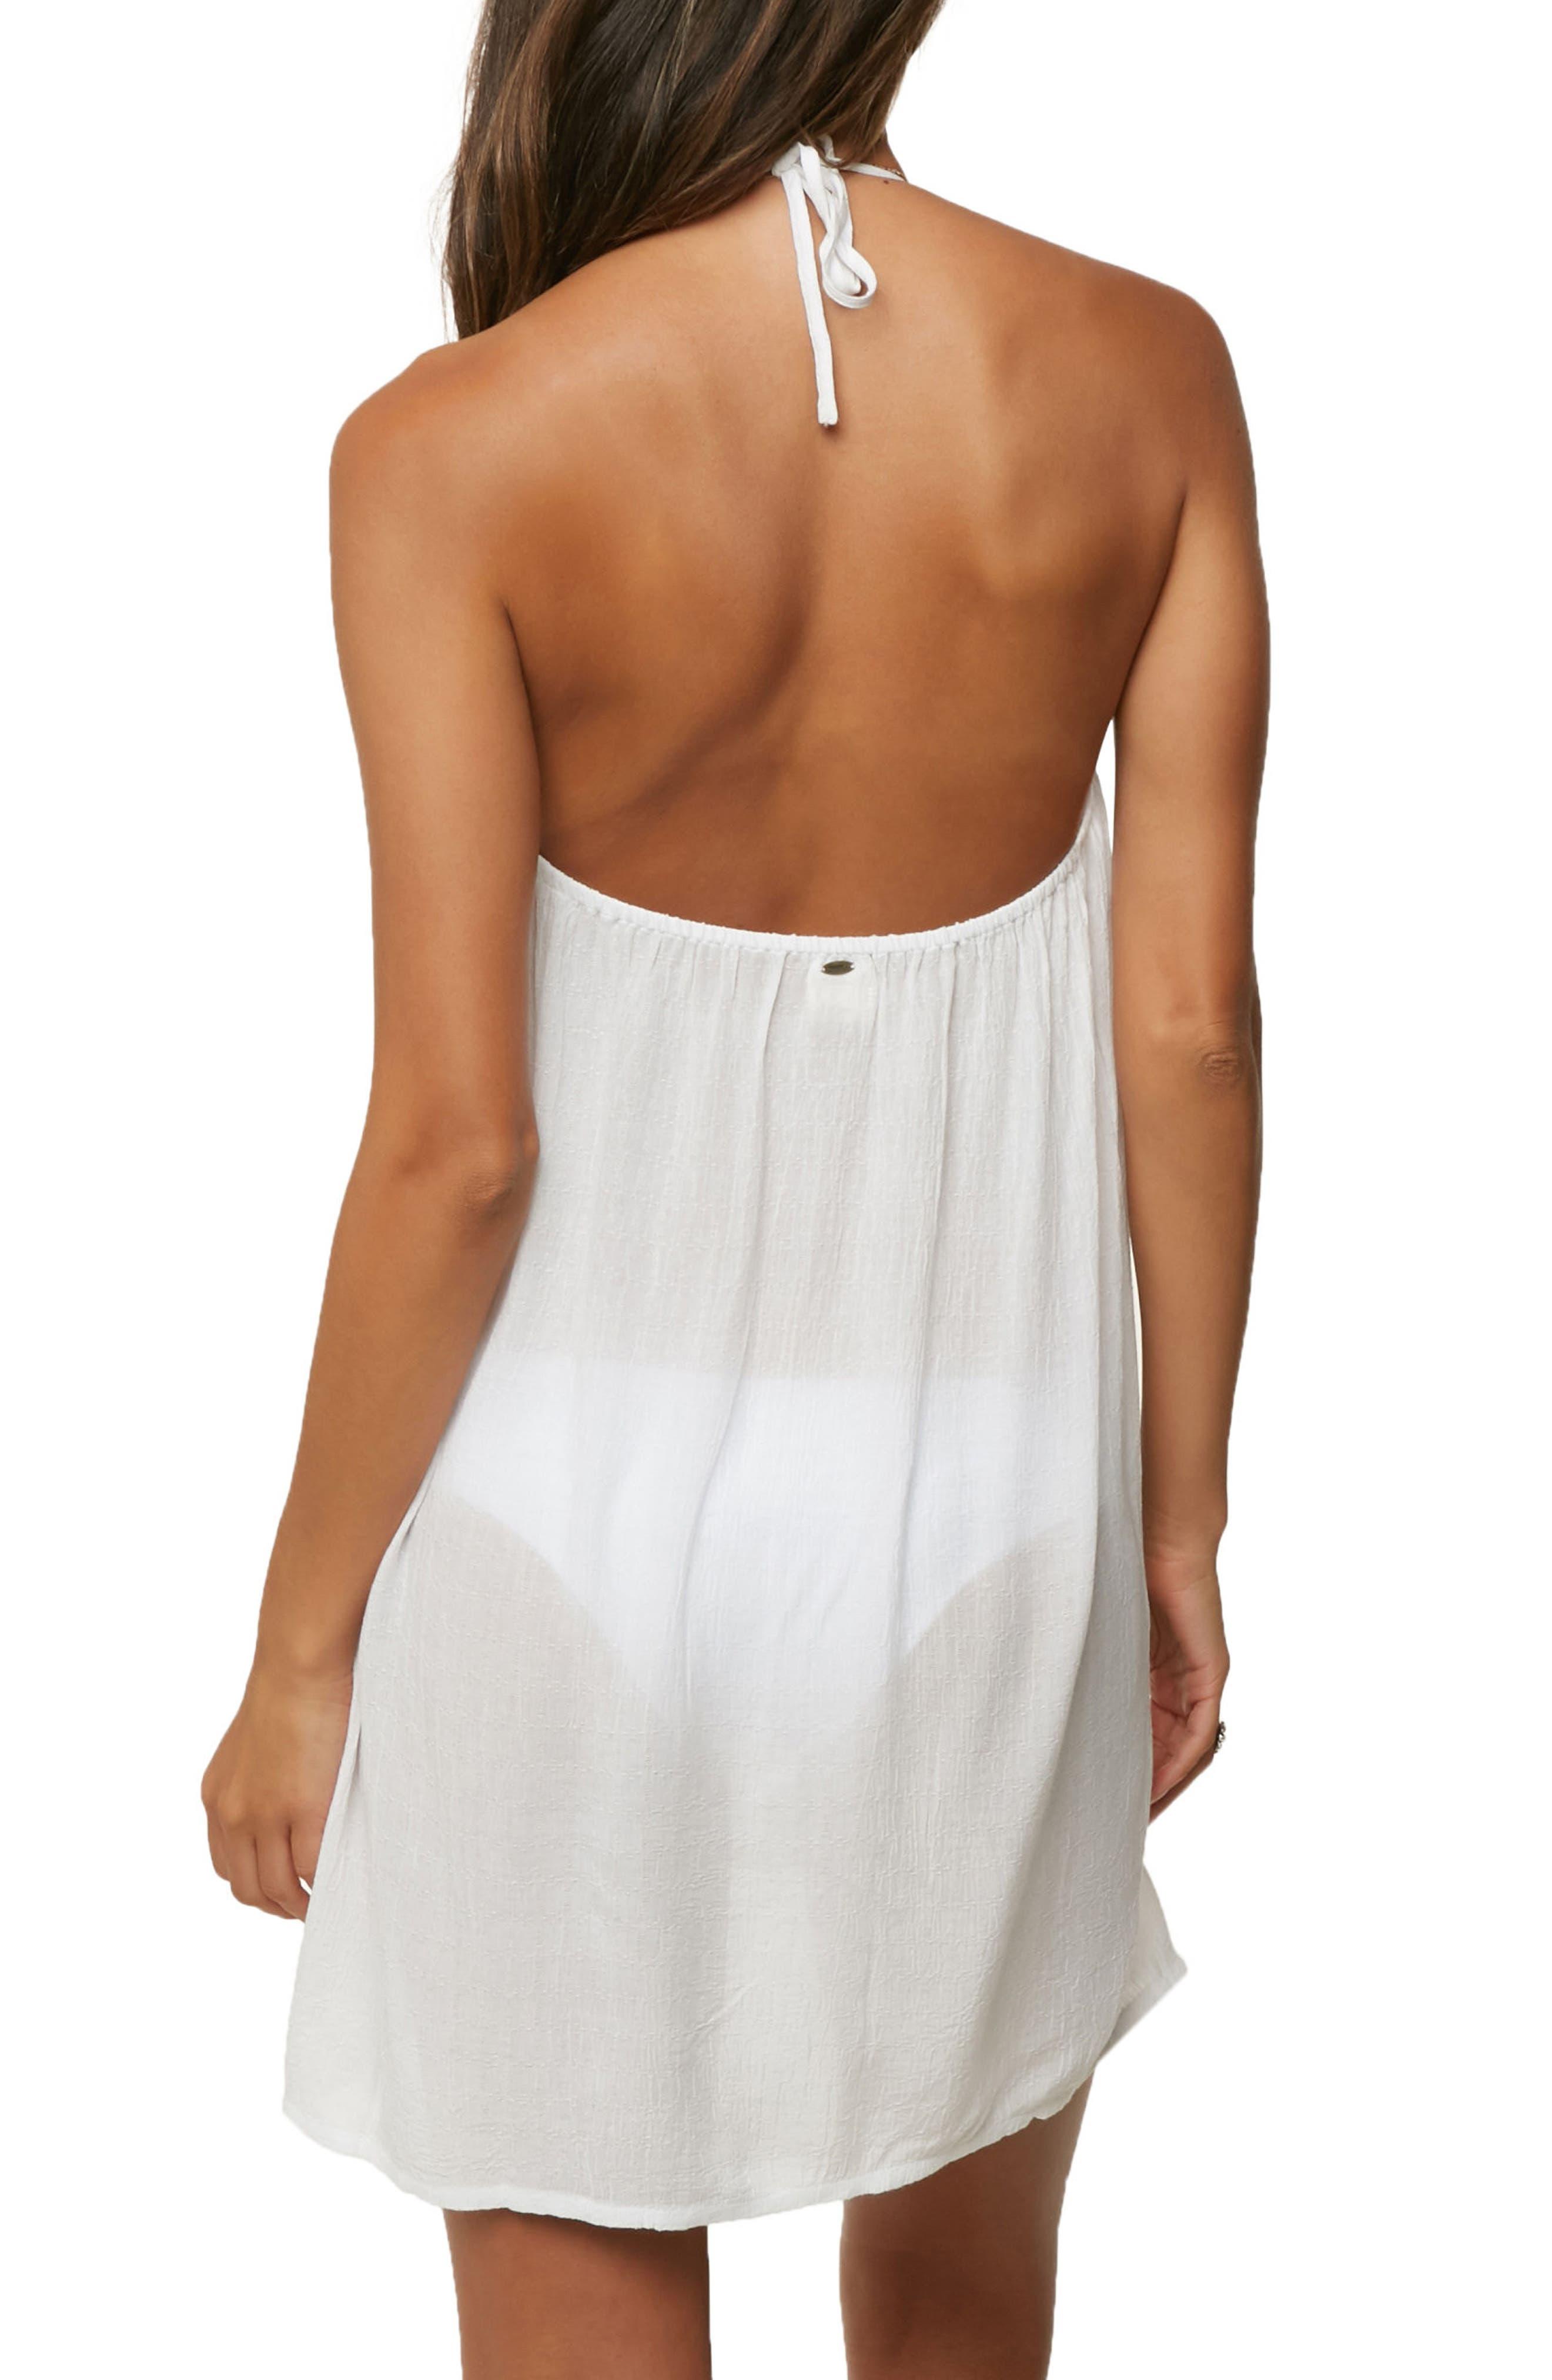 Waimea Cover-Up Halter Dress,                             Alternate thumbnail 2, color,                             100